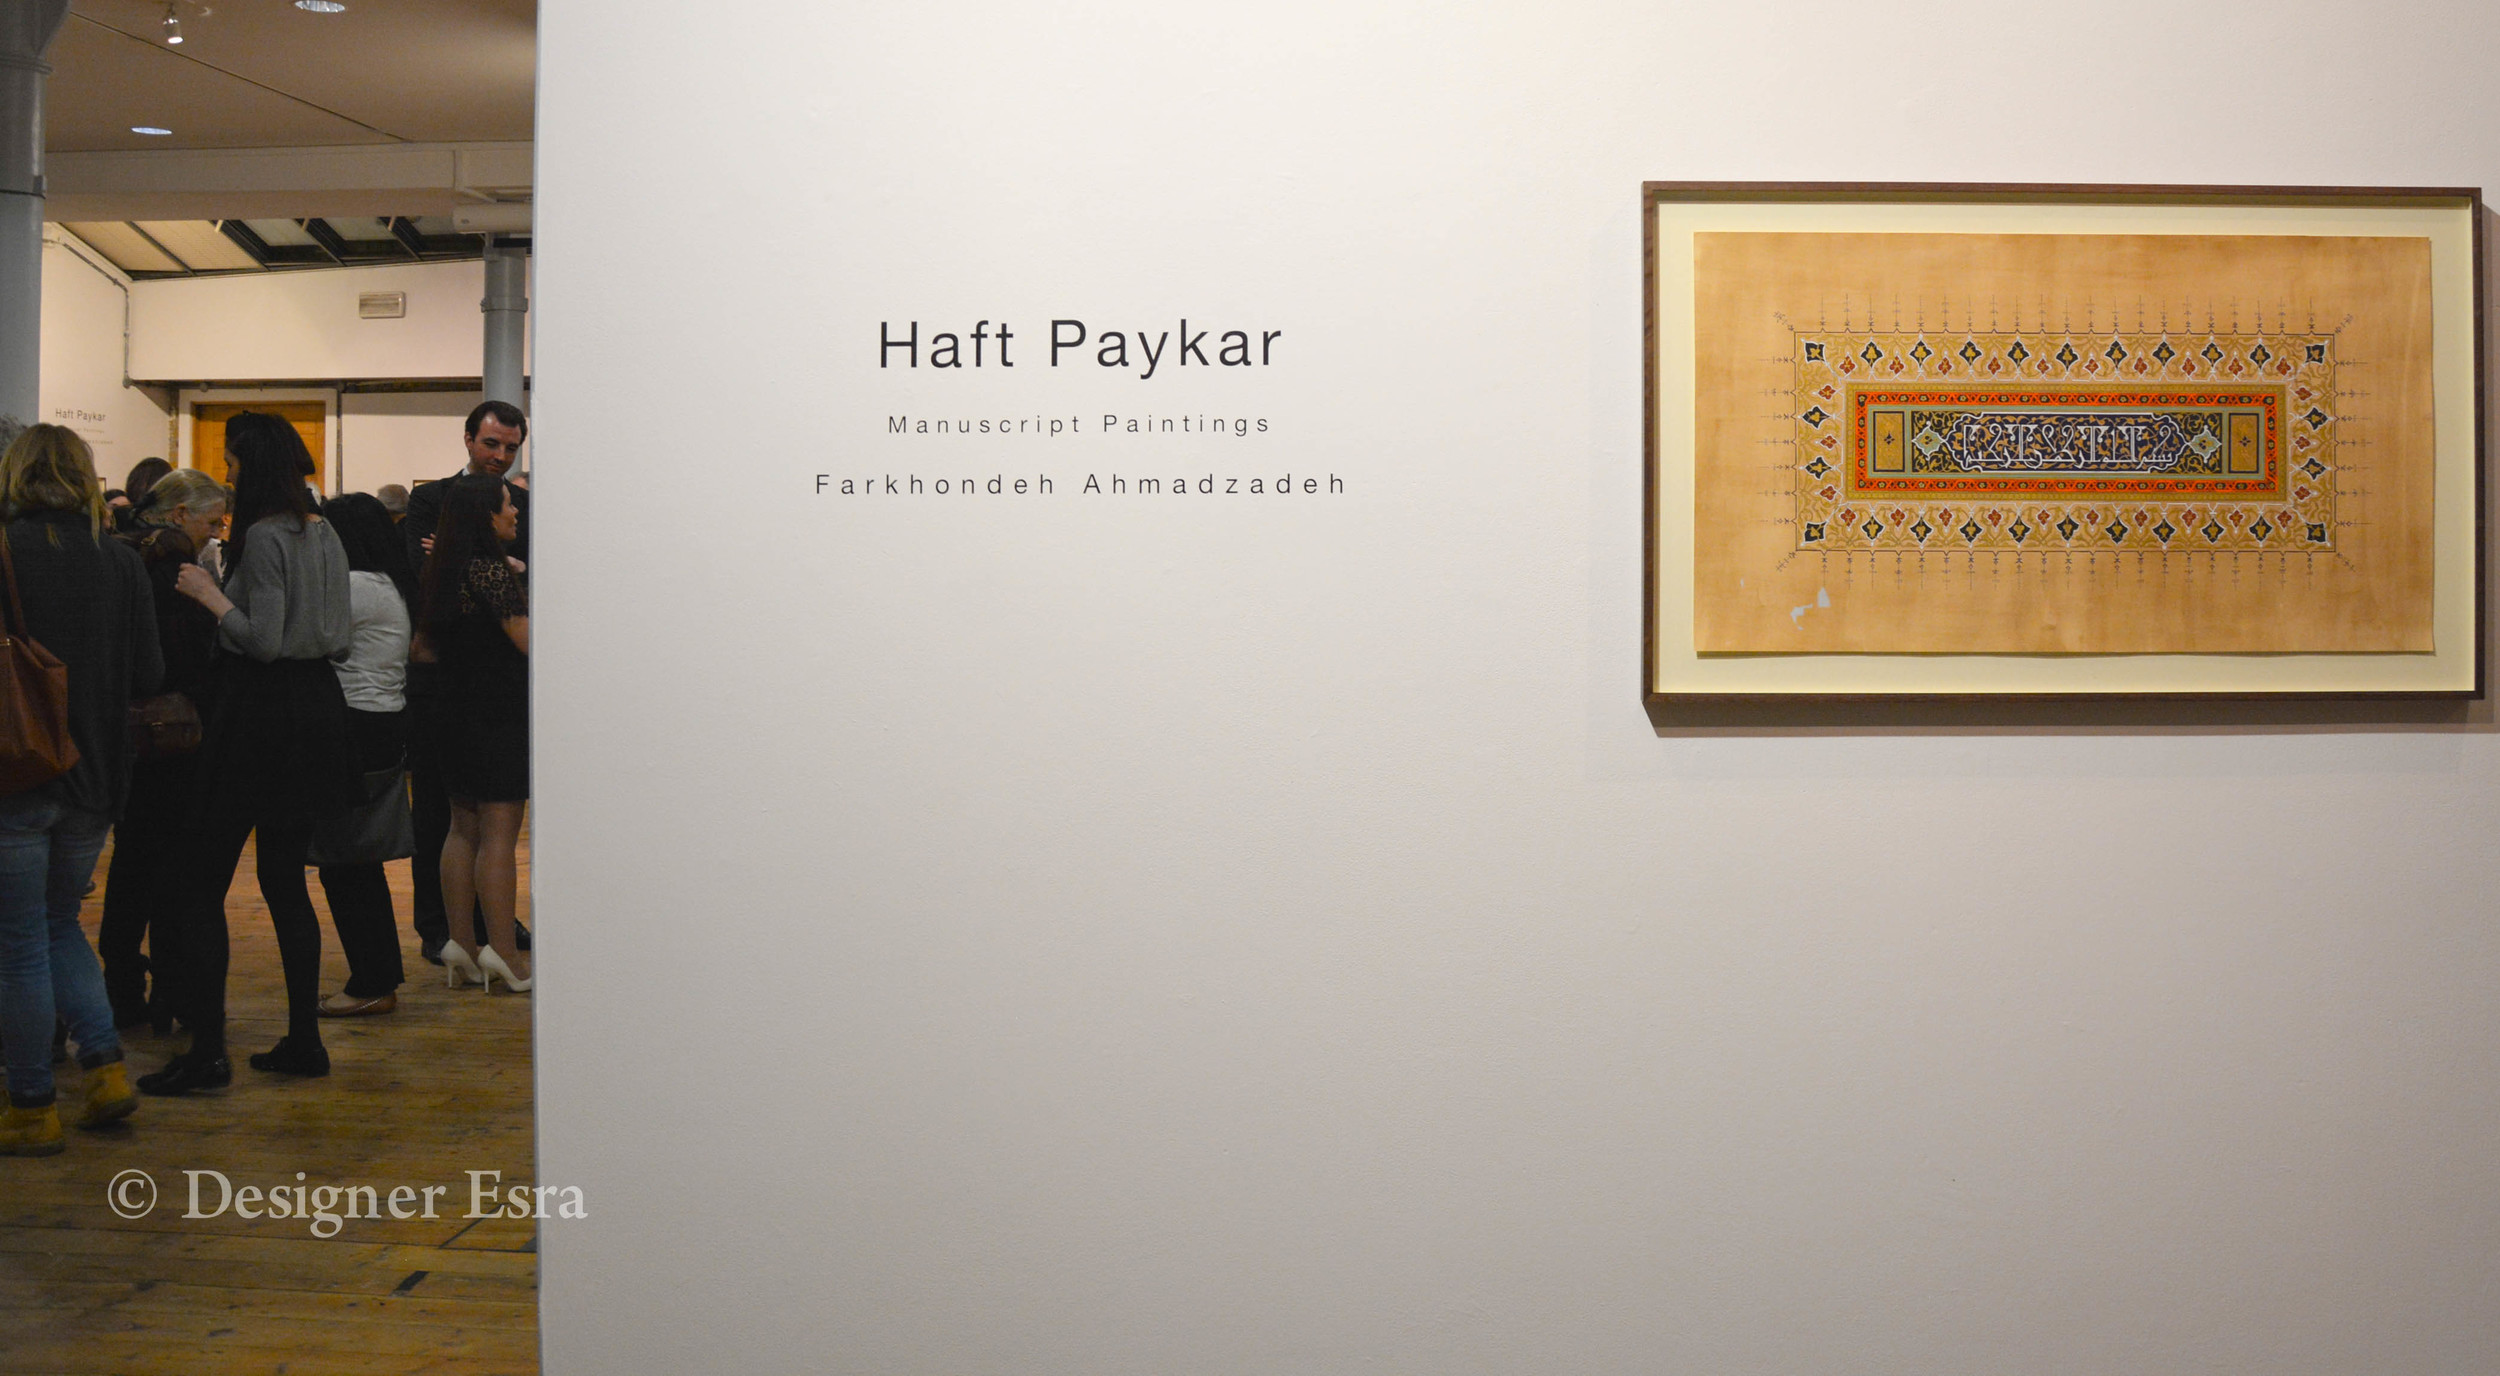 Haft Paykar Exhibition by Farkhondeh Ahamadzadeh